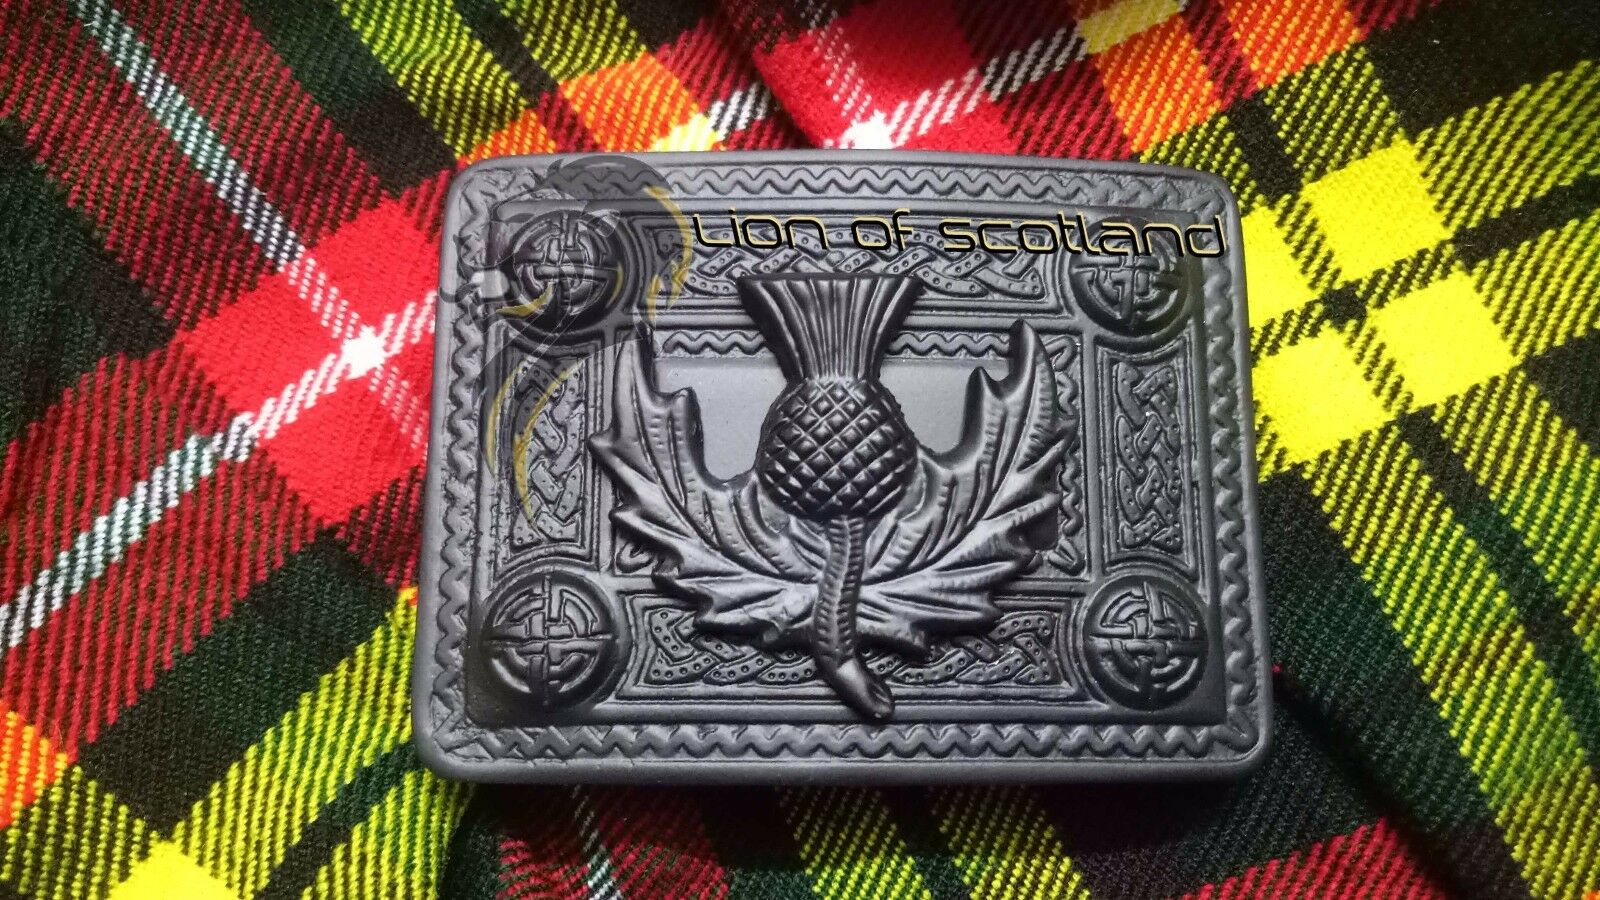 Scottish Thistle Crest Kilt Belt Buckles Celtic 4 Demo Jet Black Finish Celtic